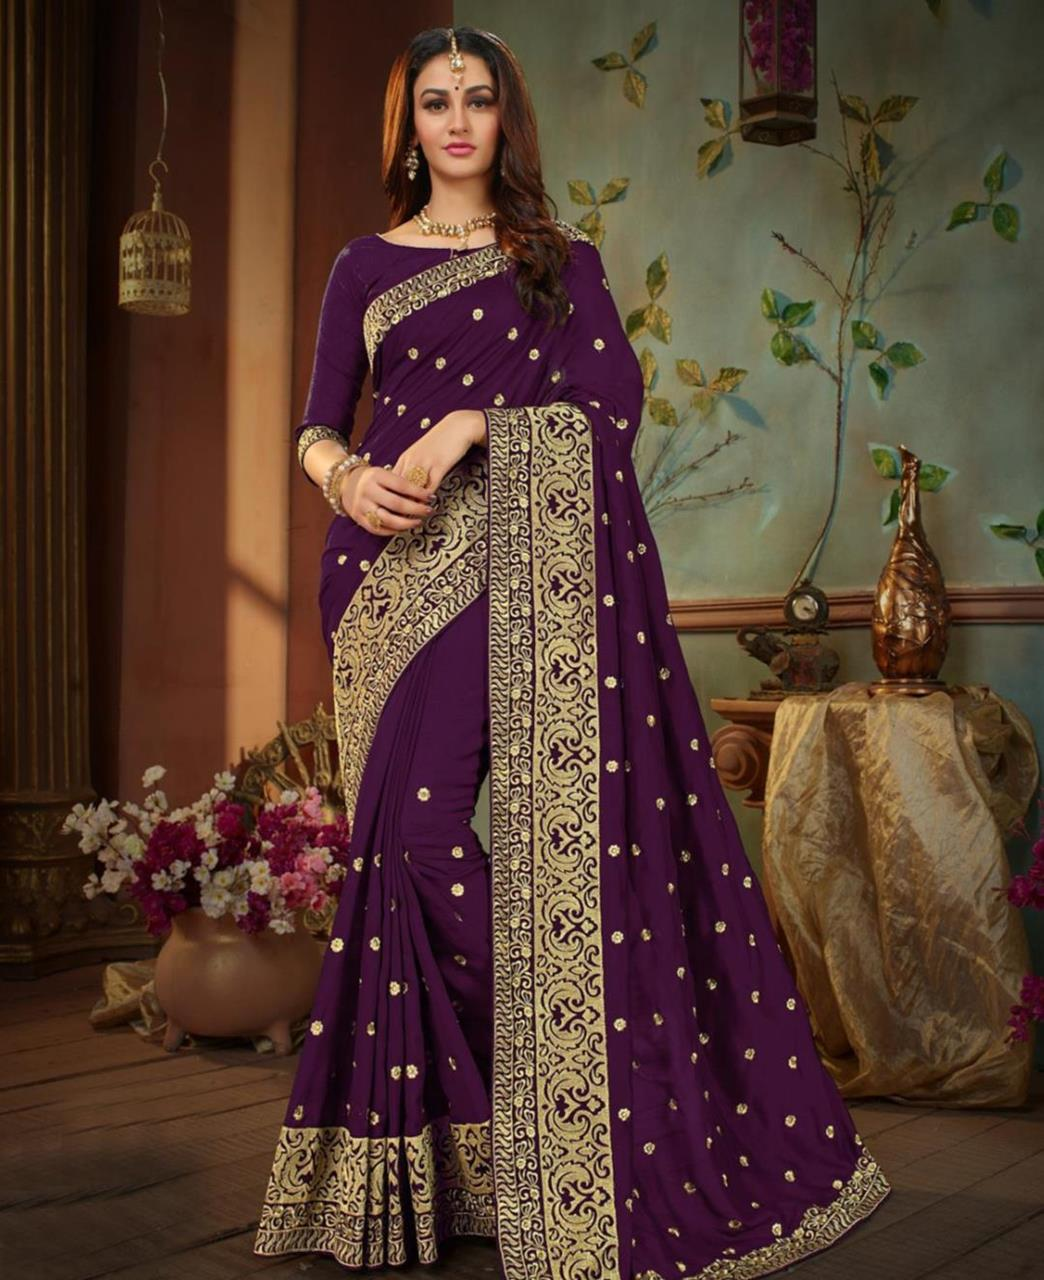 Embroidered Silk Saree (Sari) in  Violet